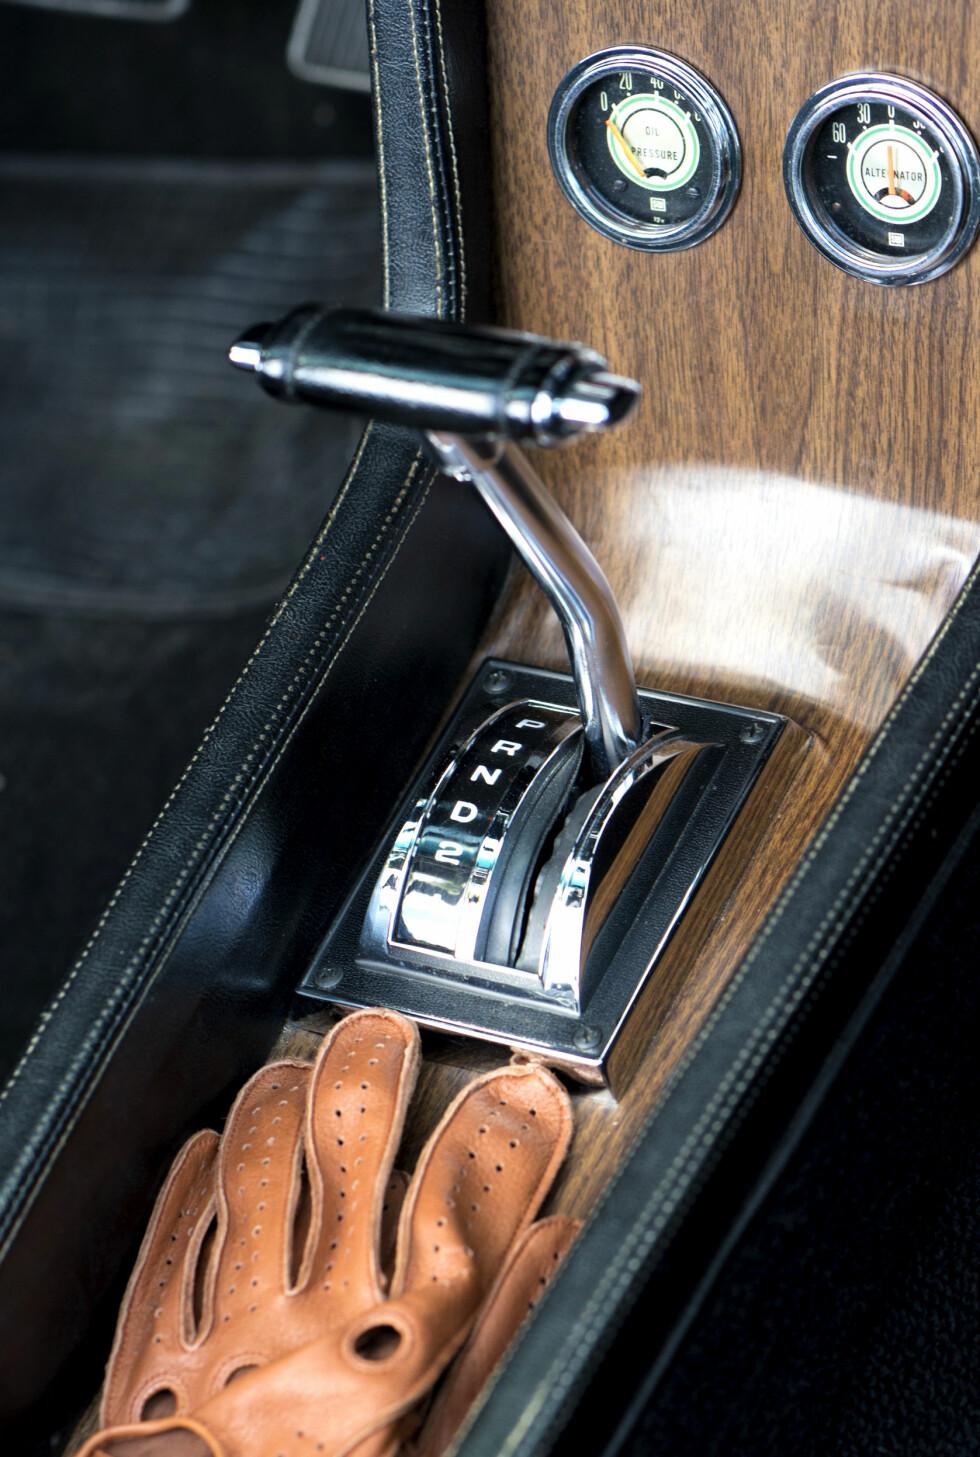 AUTOMAT:Tretrinns kasse gir silkemyk kraftoverføring. Foto: Paal Kvamme.